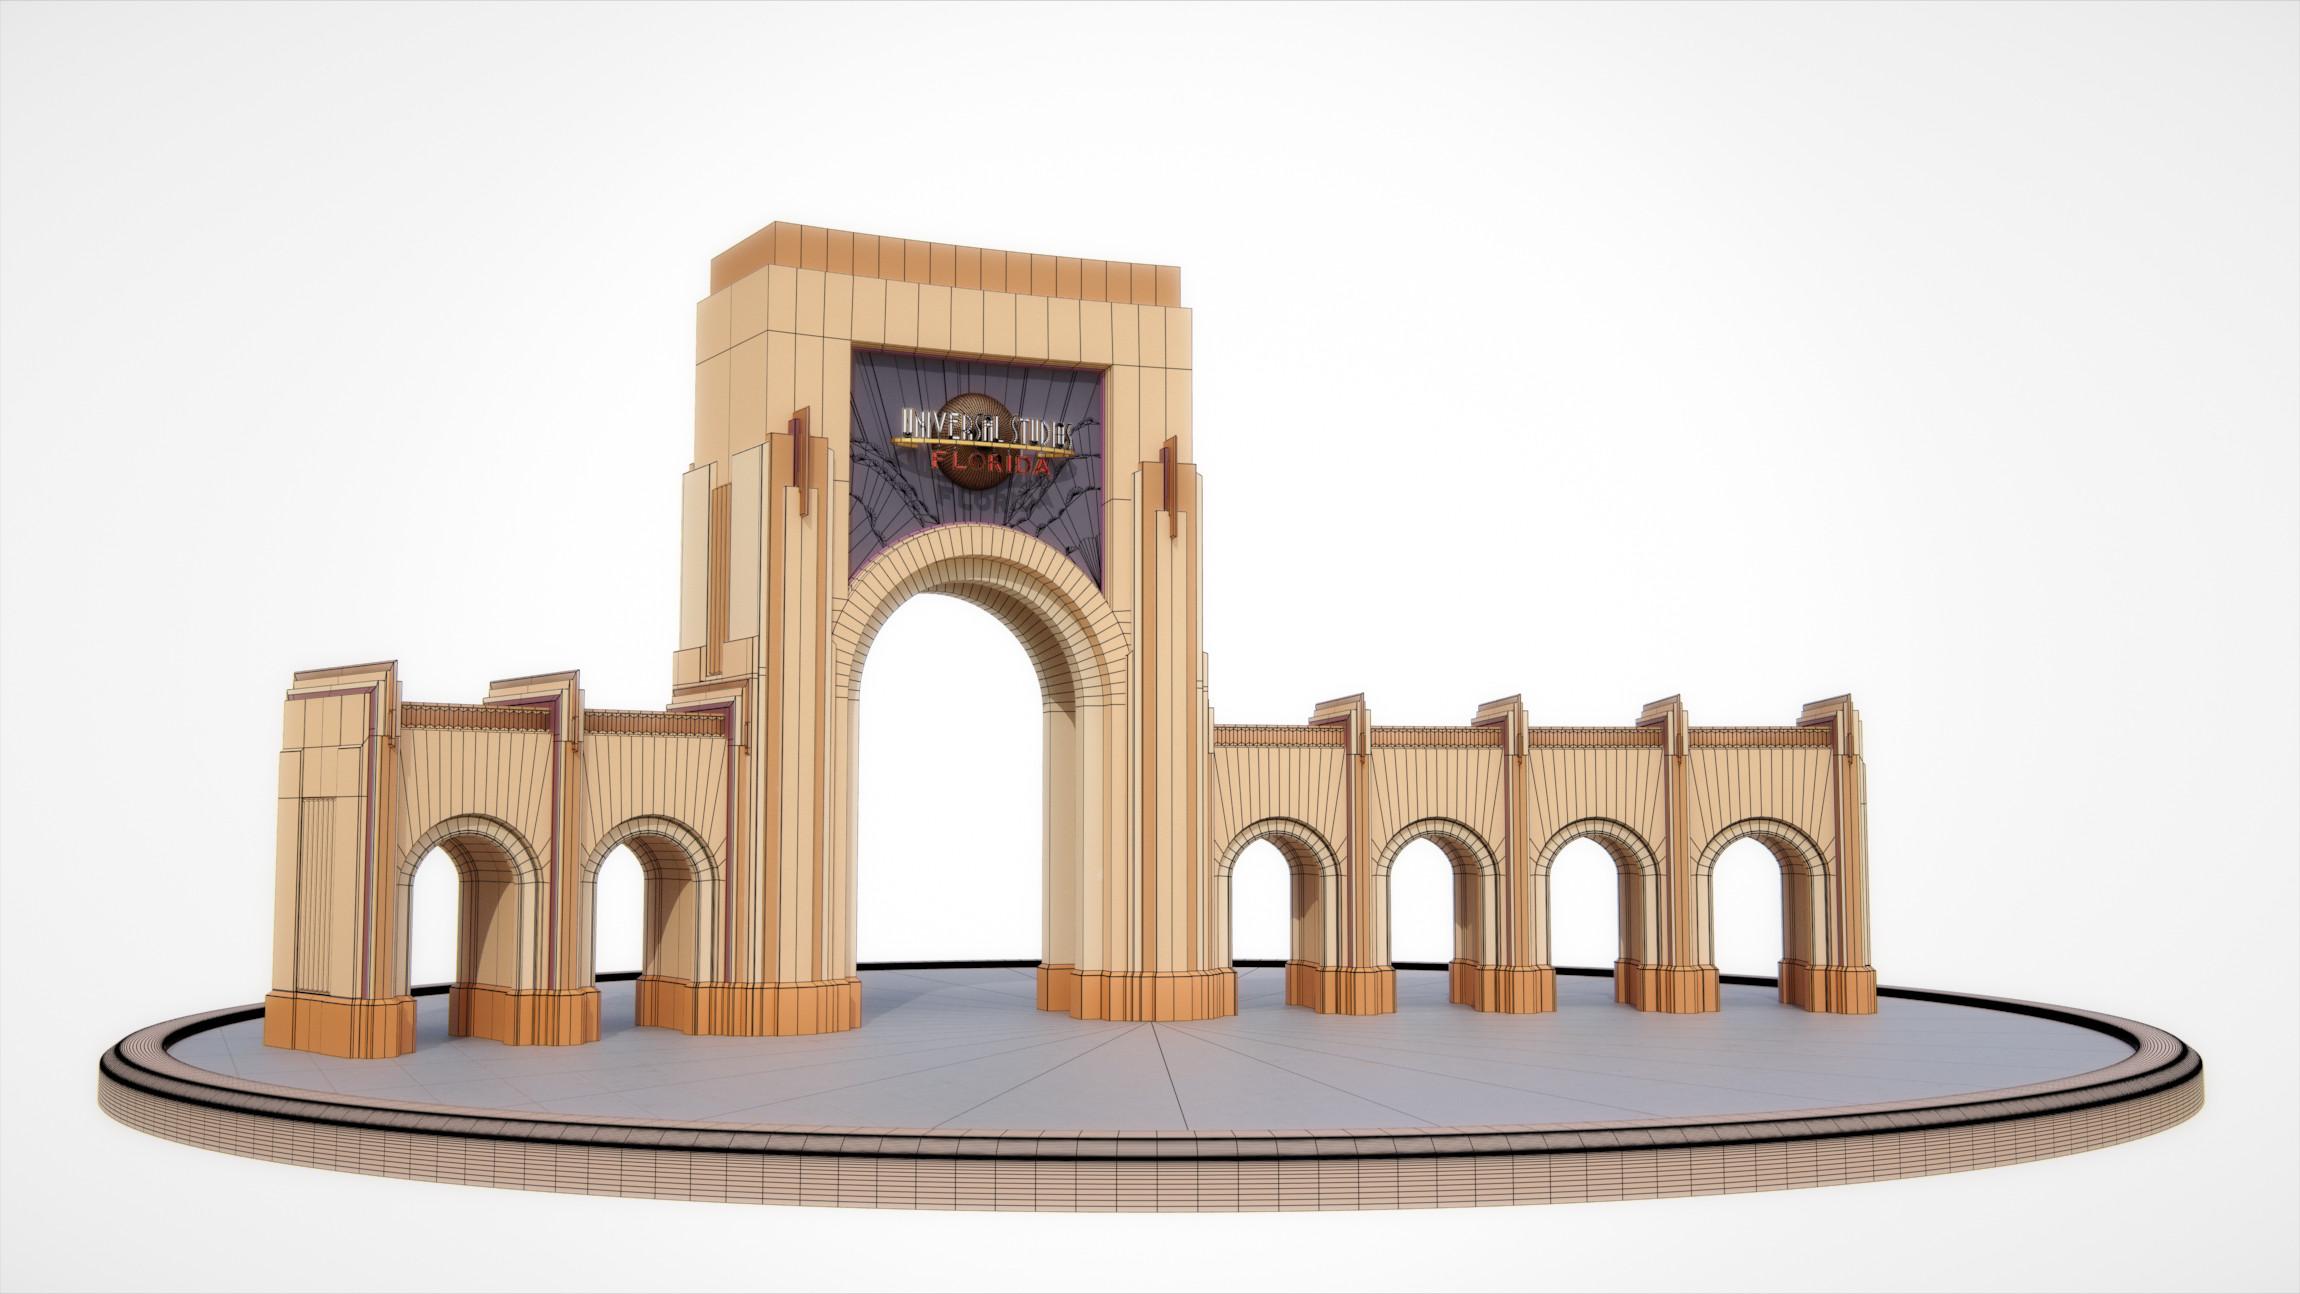 Universal Studios Florida - Entrance Archway - Wireframe